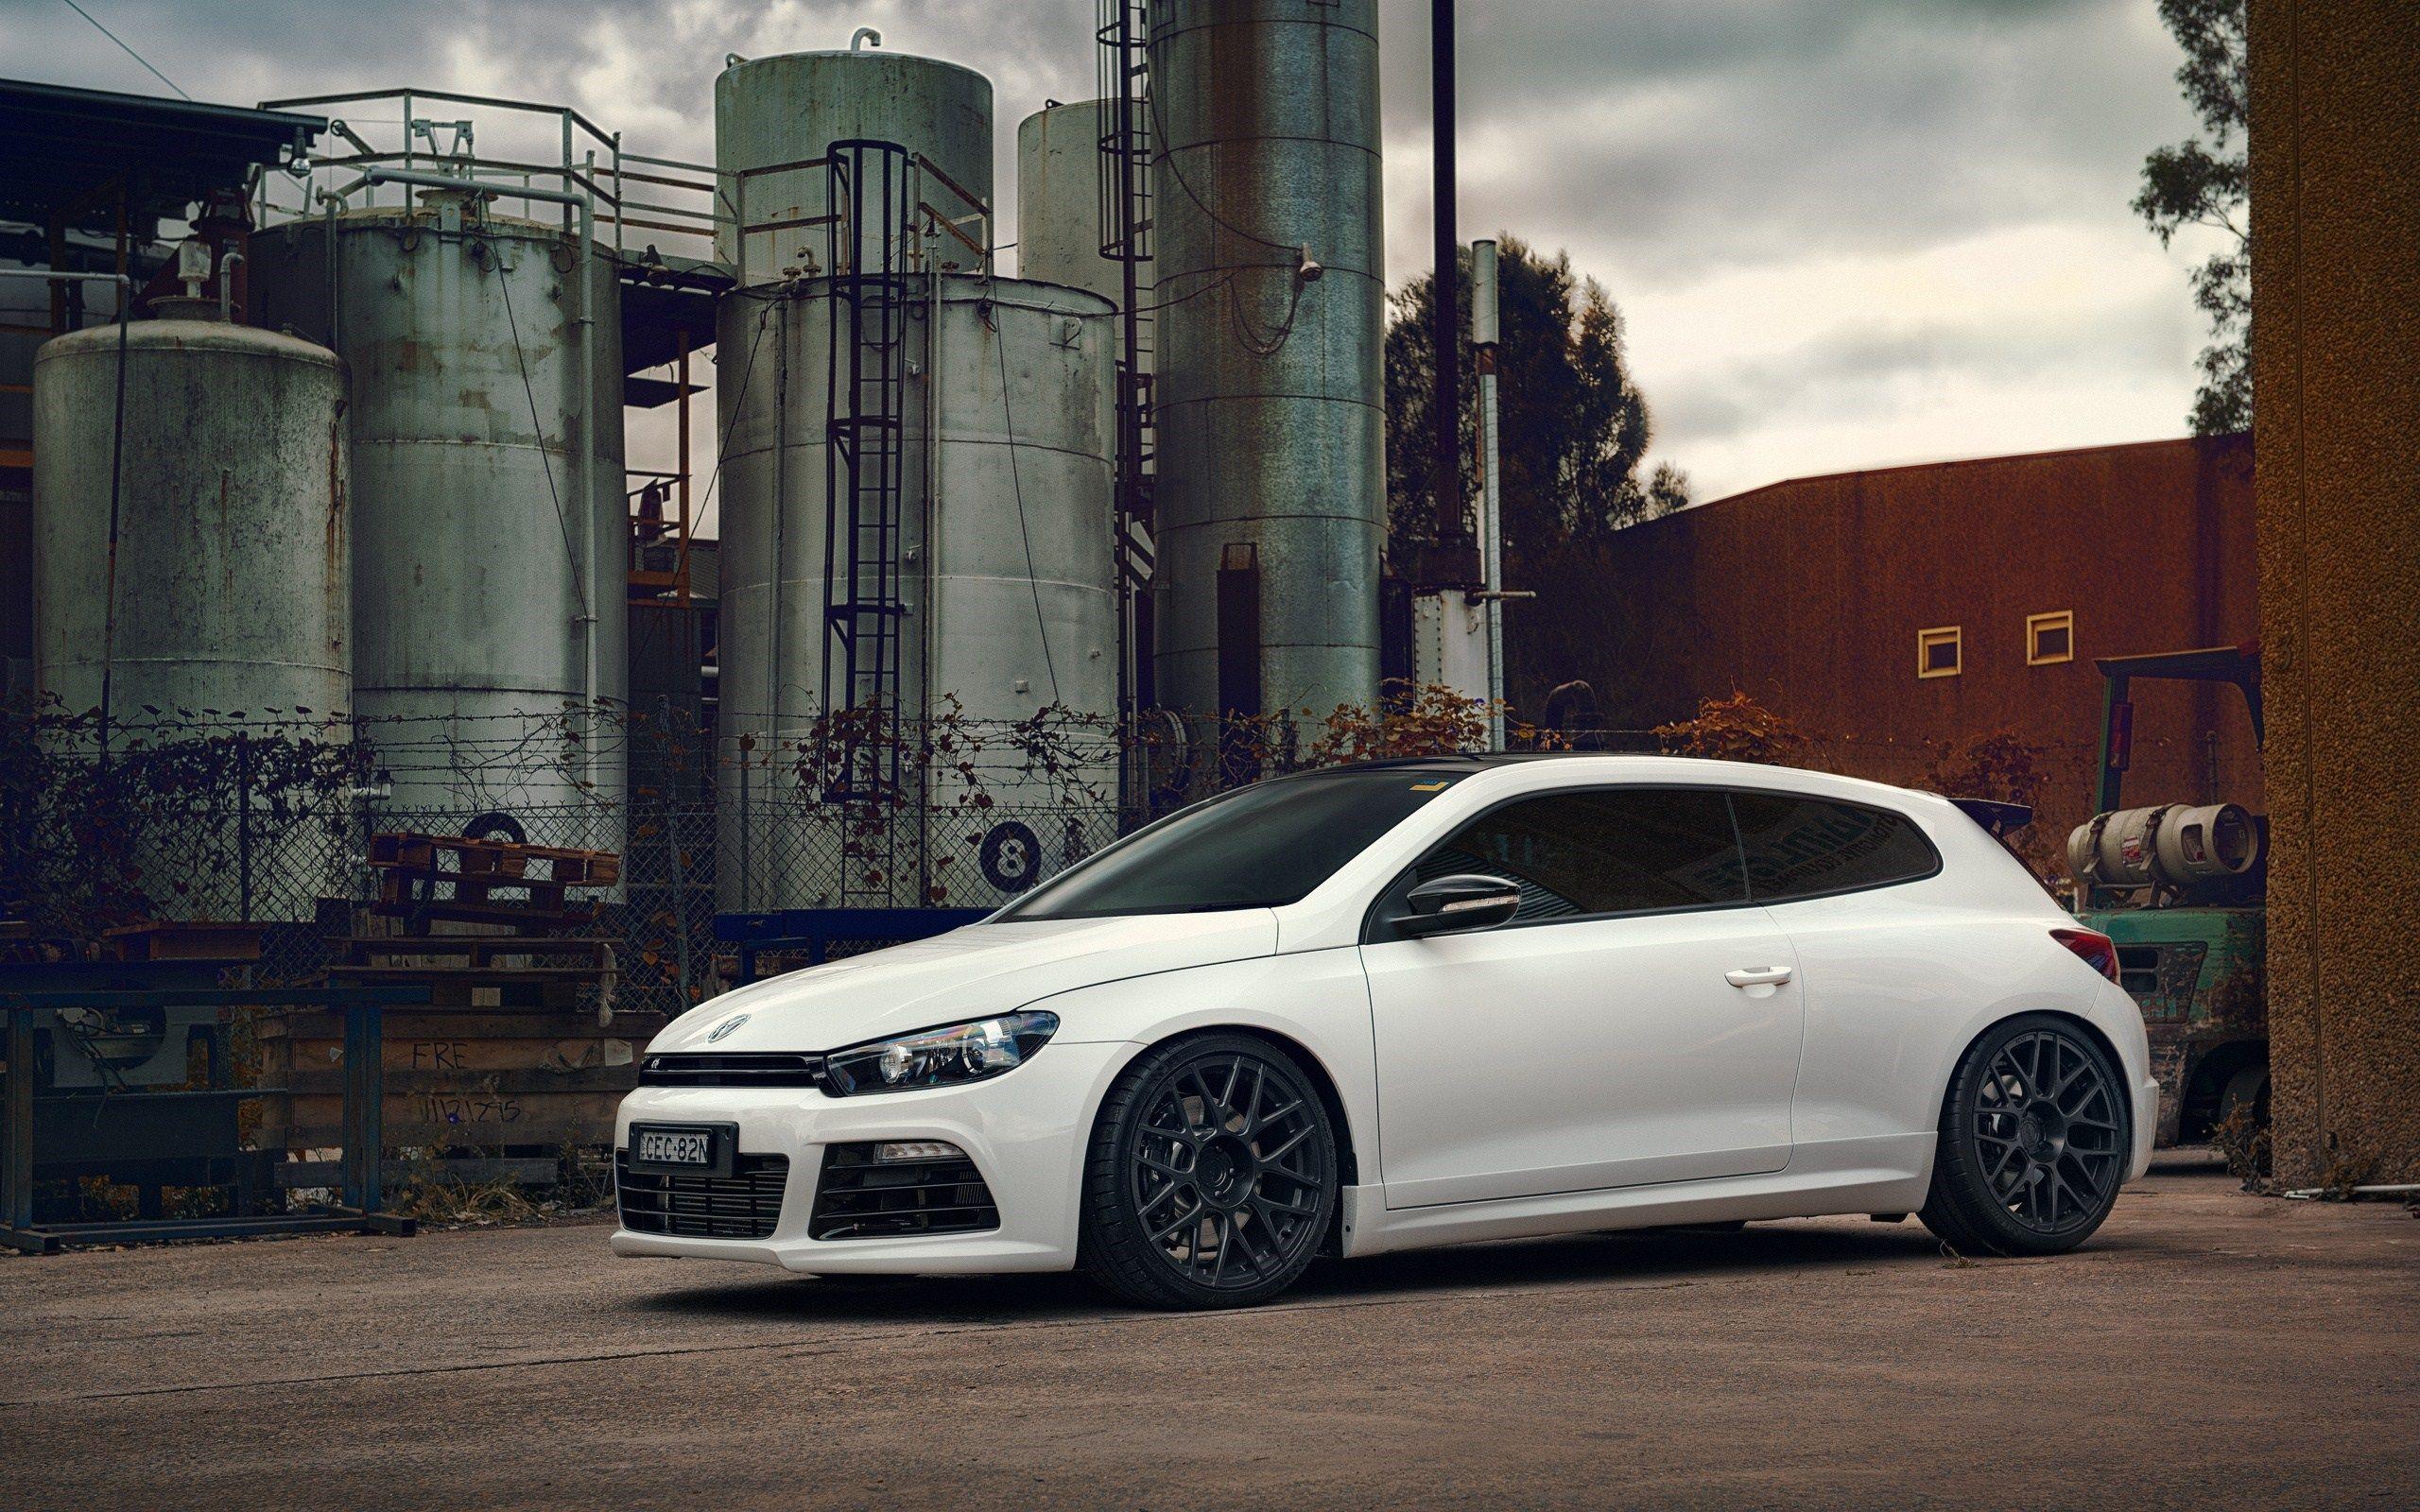 Volkswagen Scirocco R Wallpaper Photos And Photography